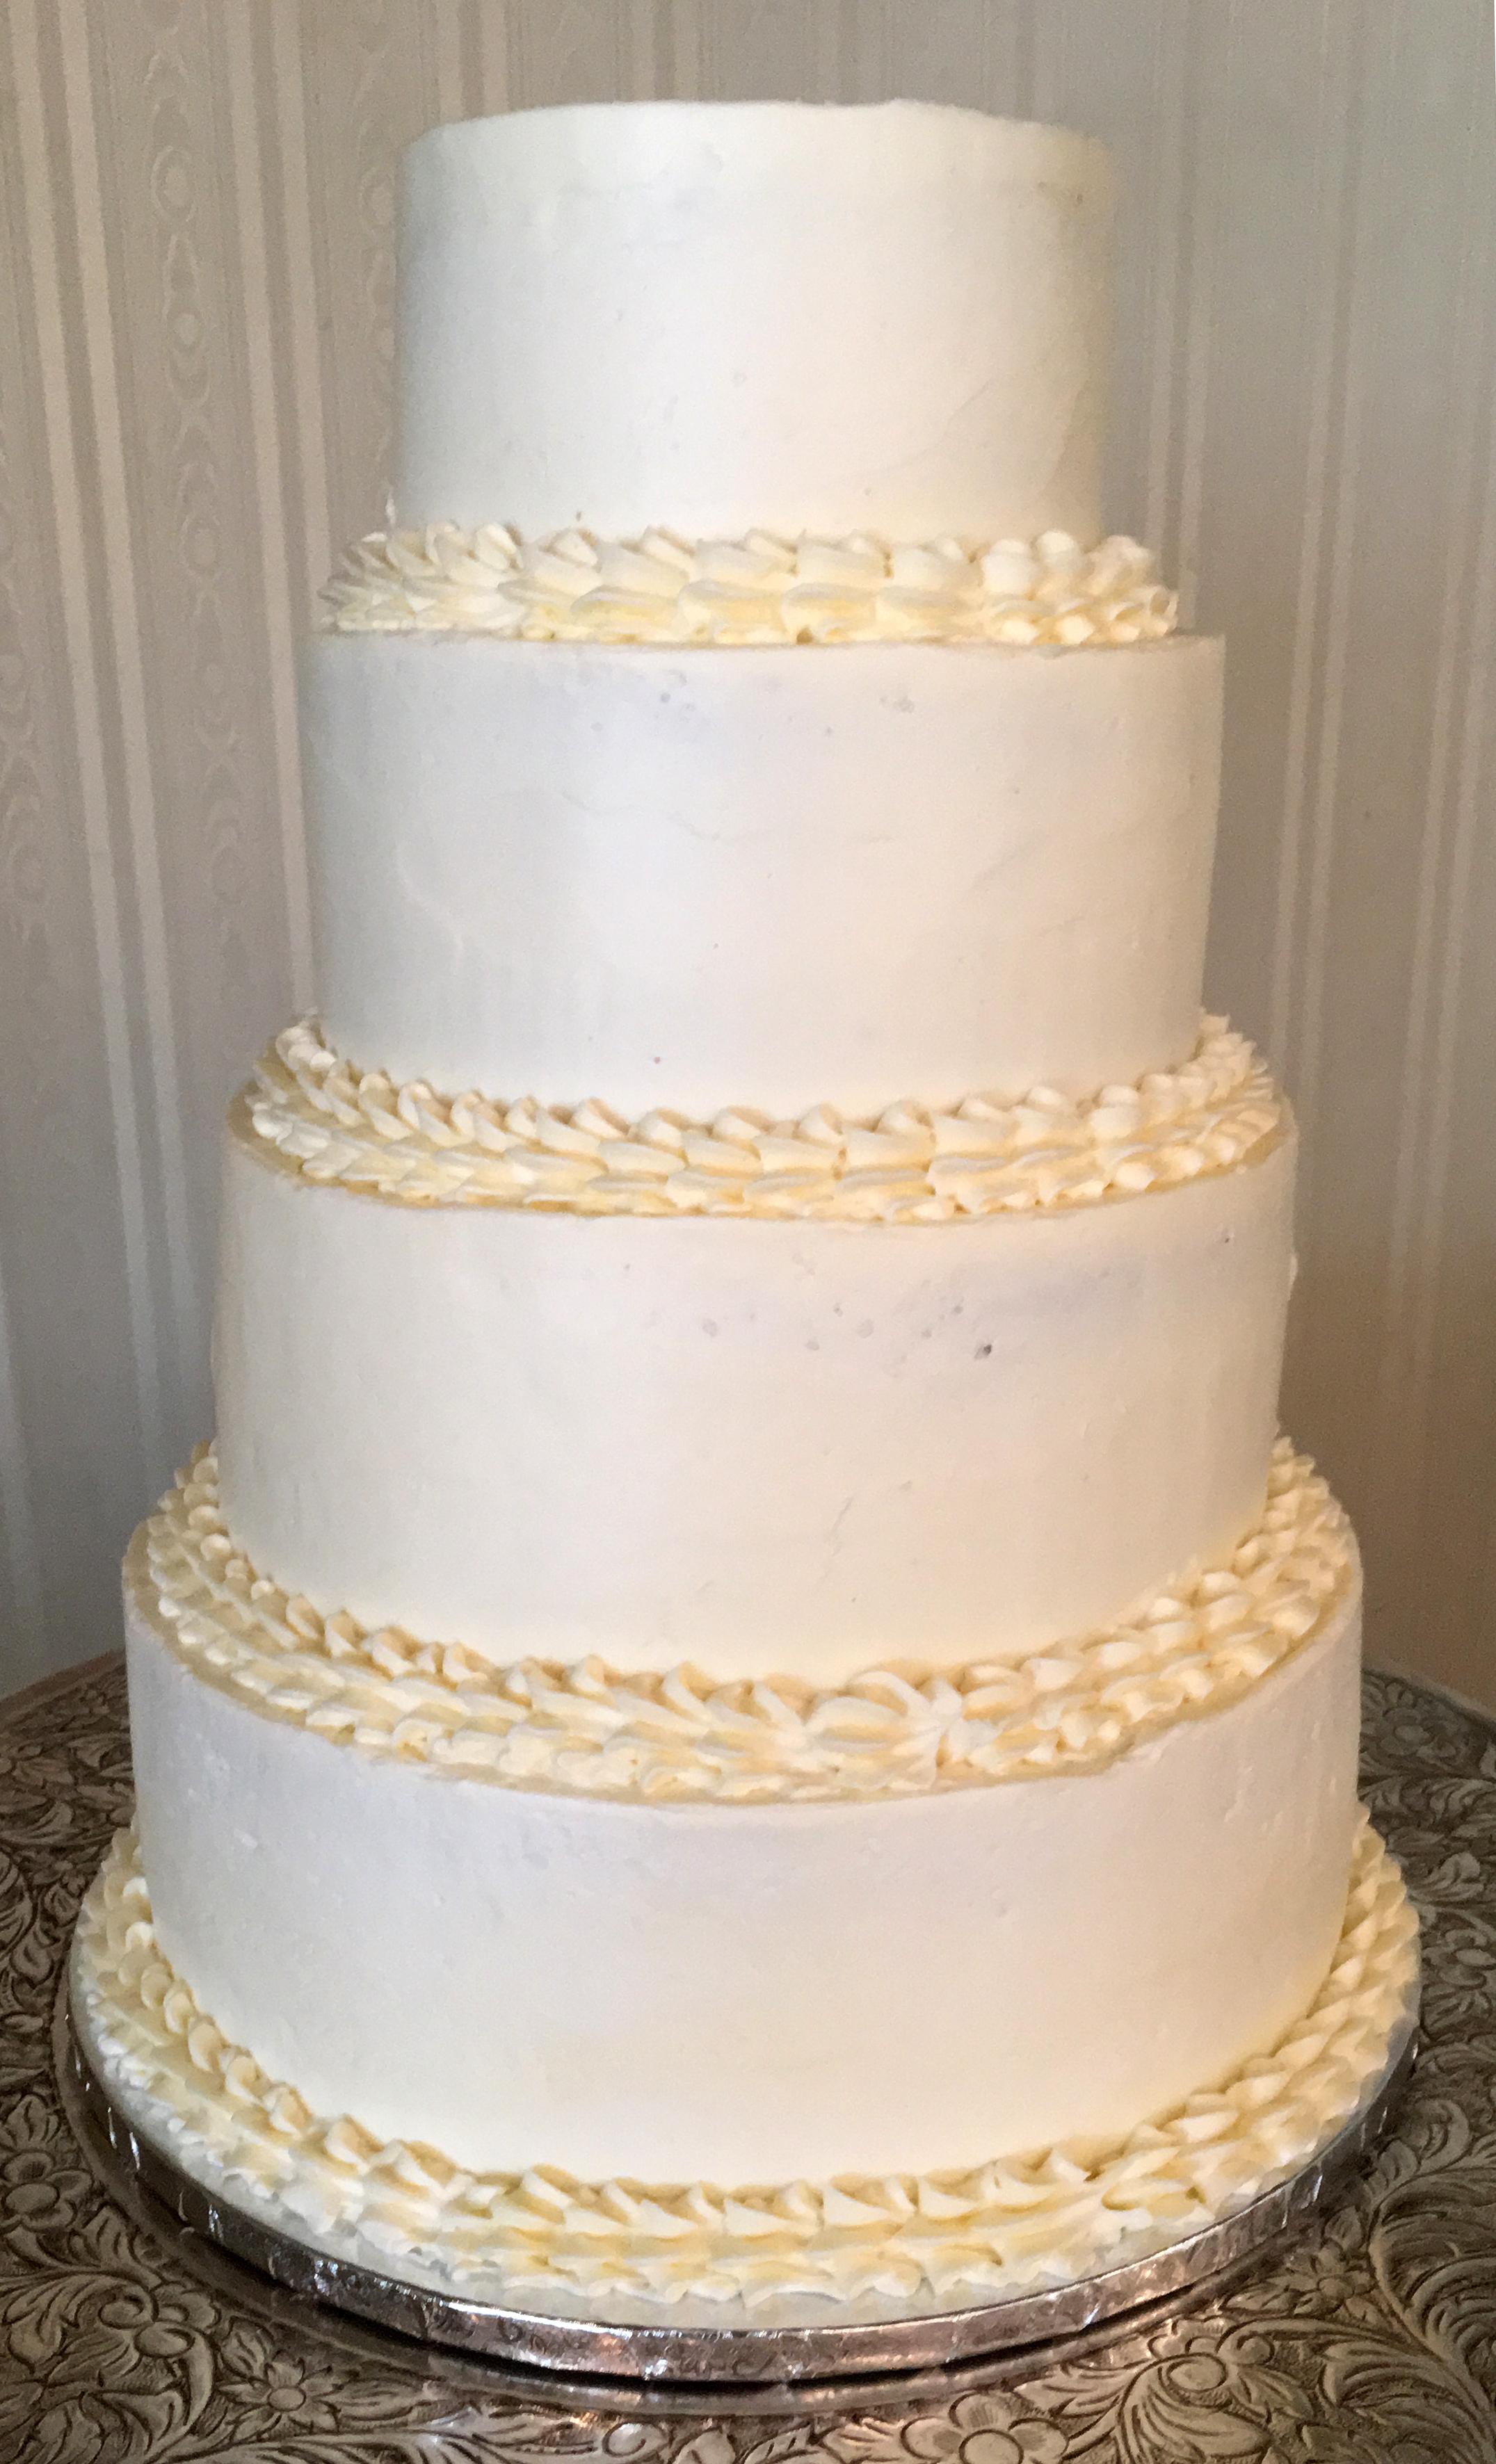 edited cake 2